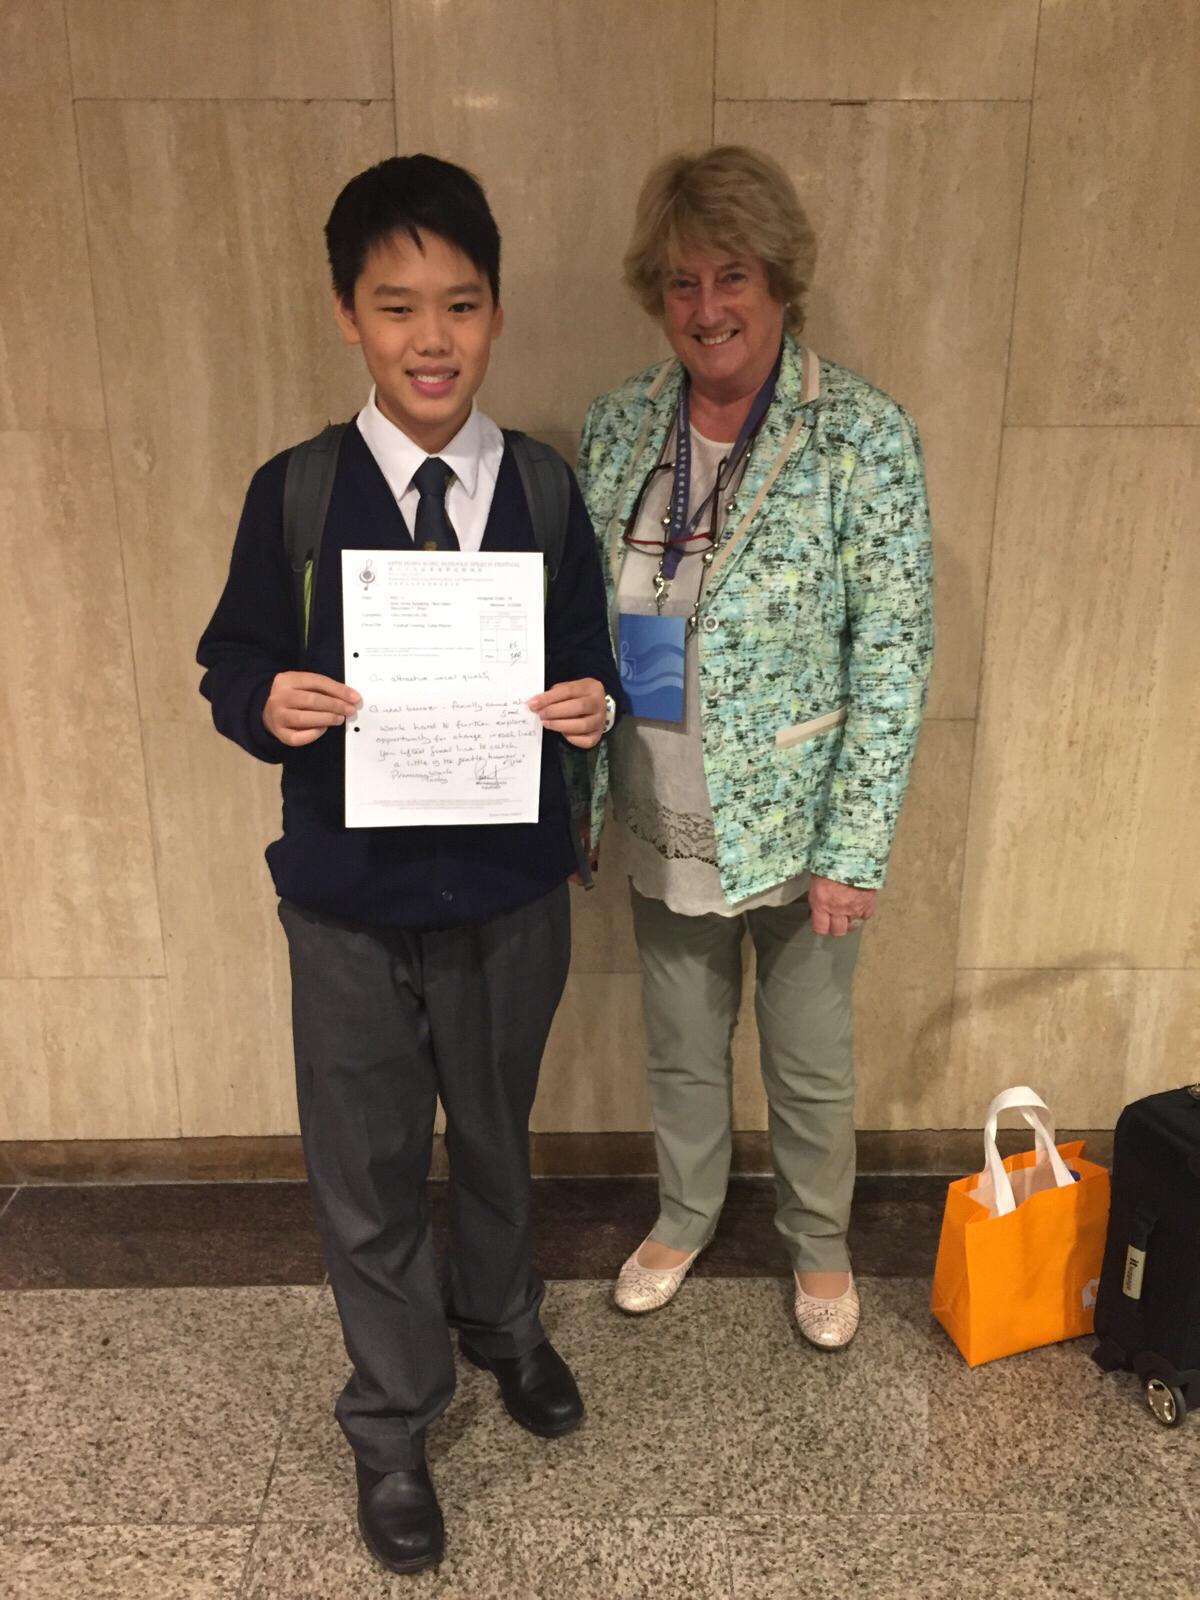 1C Chiu Jordan Ho Chi got the 3rd place in the 69th Speech Festival (Solo Verse, Boys).